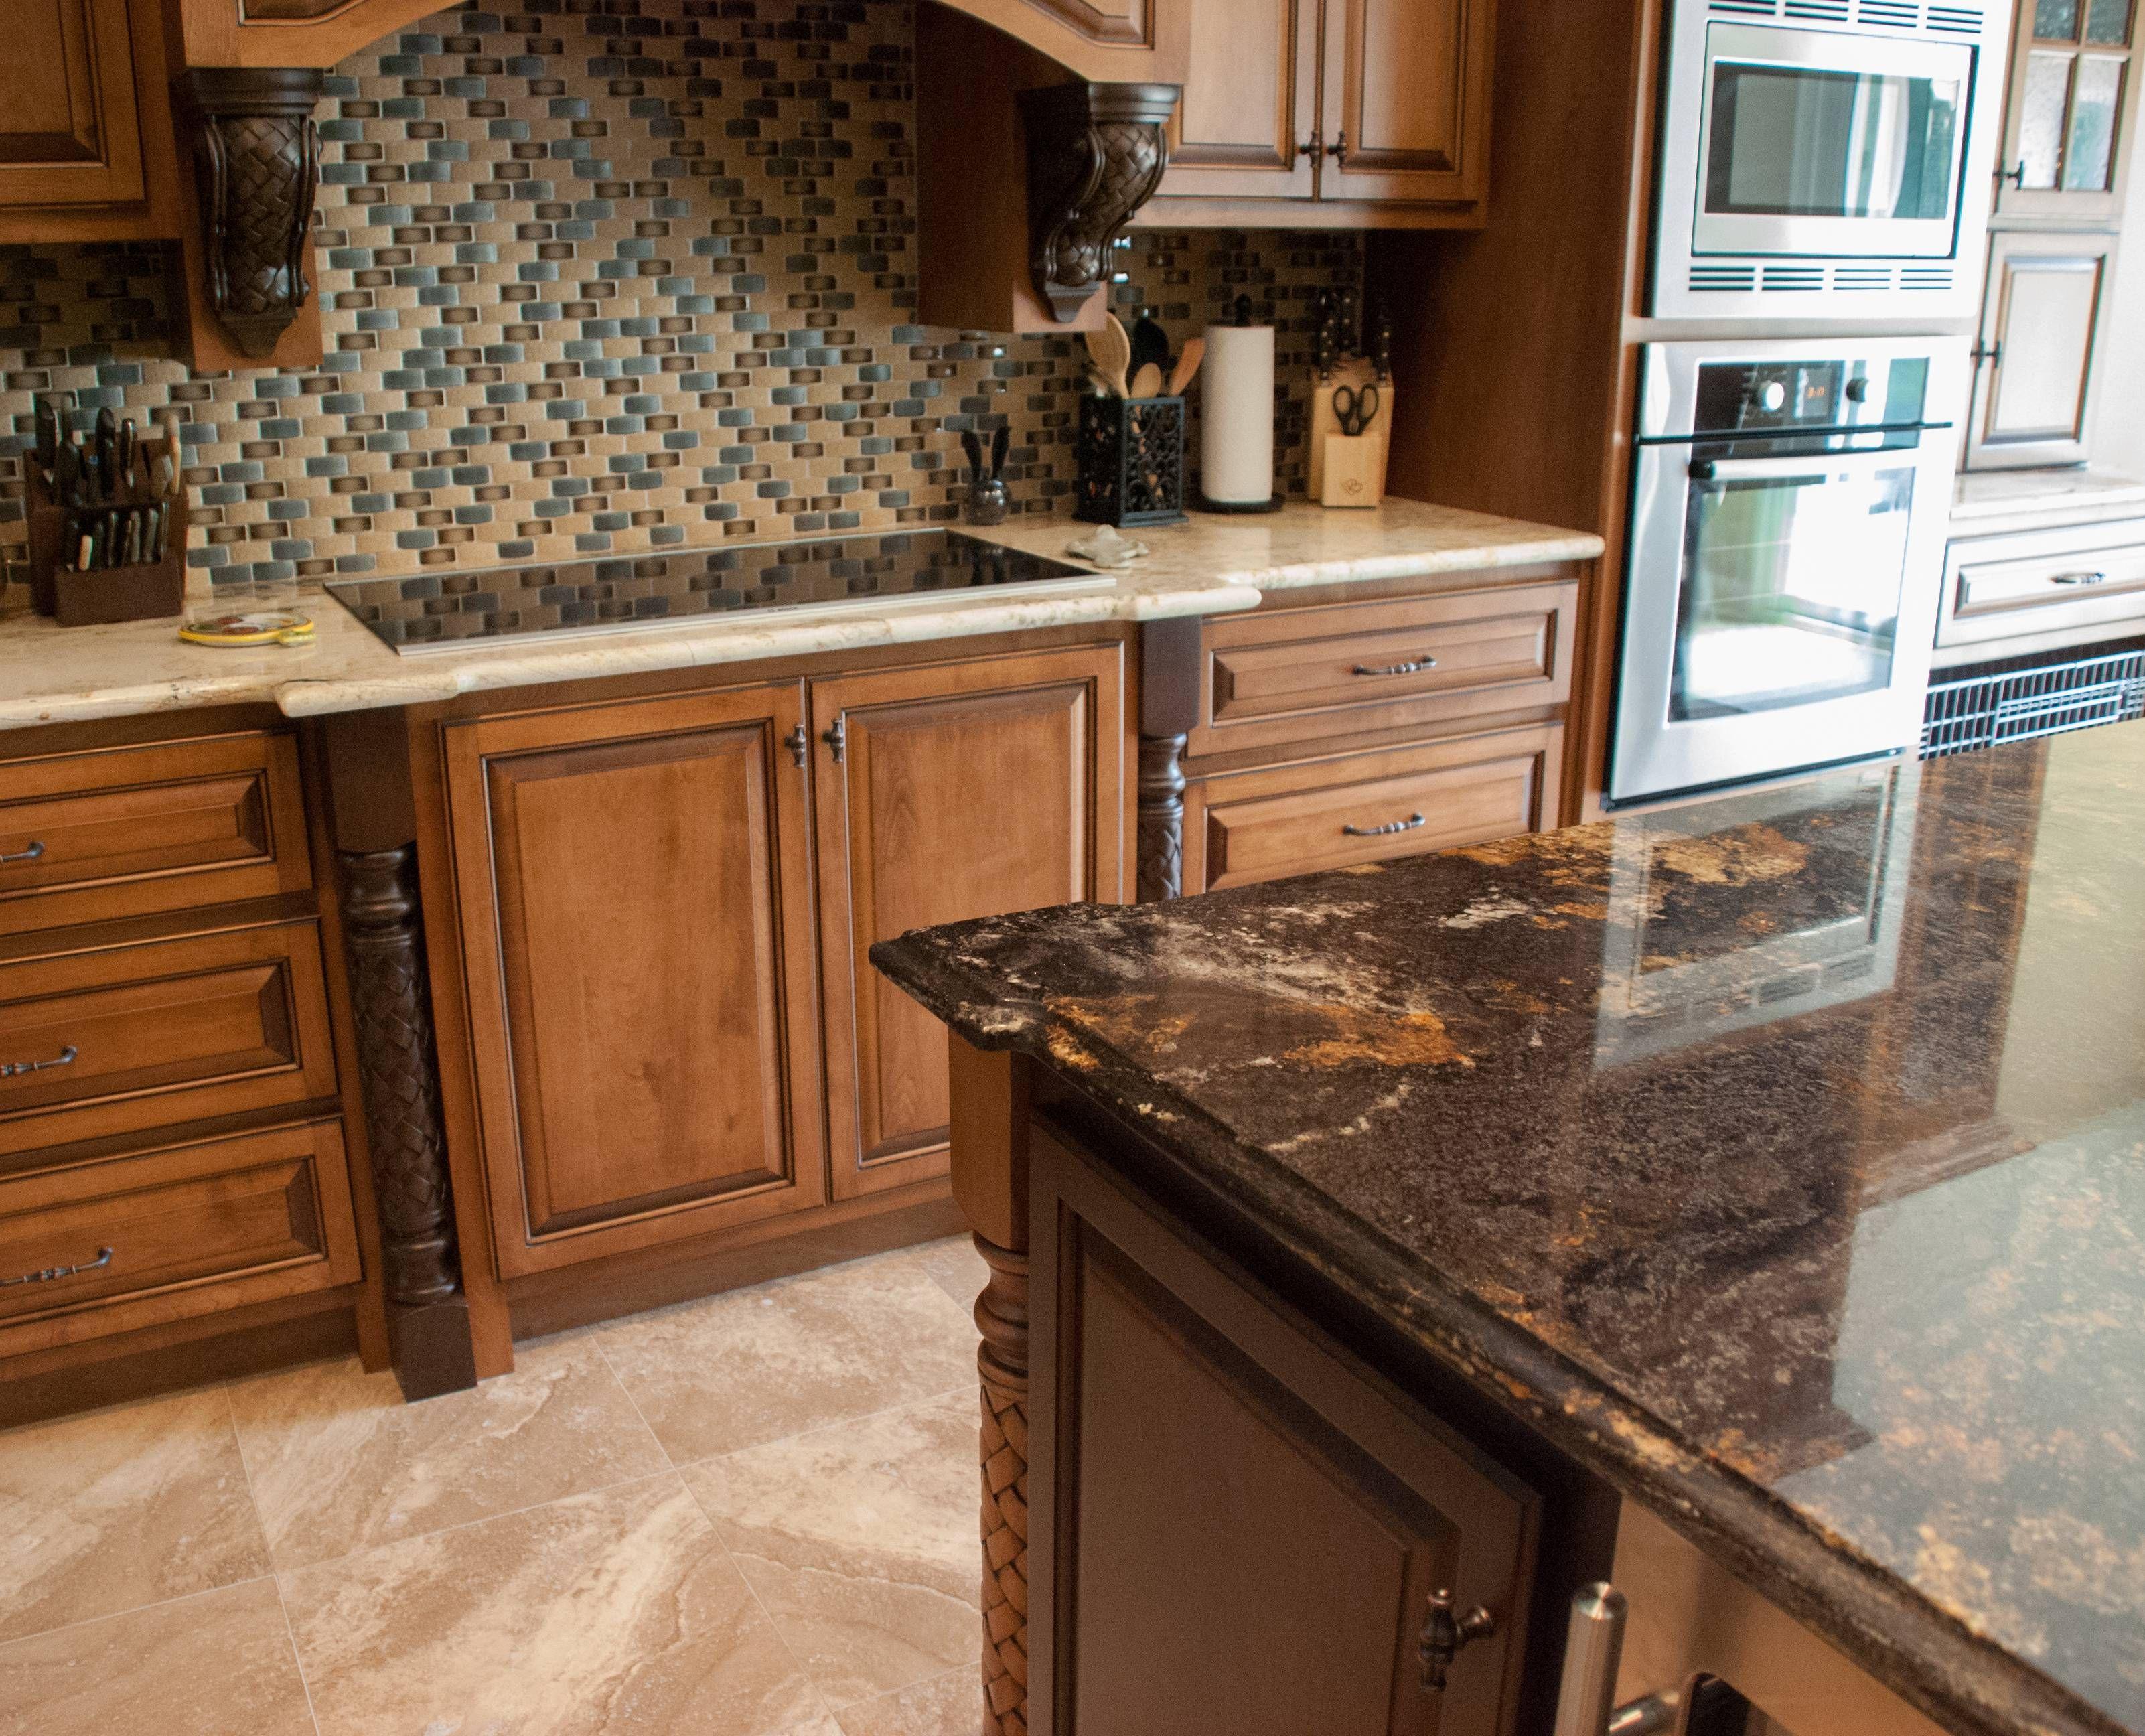 Neue Design Kuche Kabinette Wie Zu Legen U Bahn Fliesen Backsplash Corian O Granite Countertops Kitchen Kitchen Countertops Kitchen Countertops Granite Colors